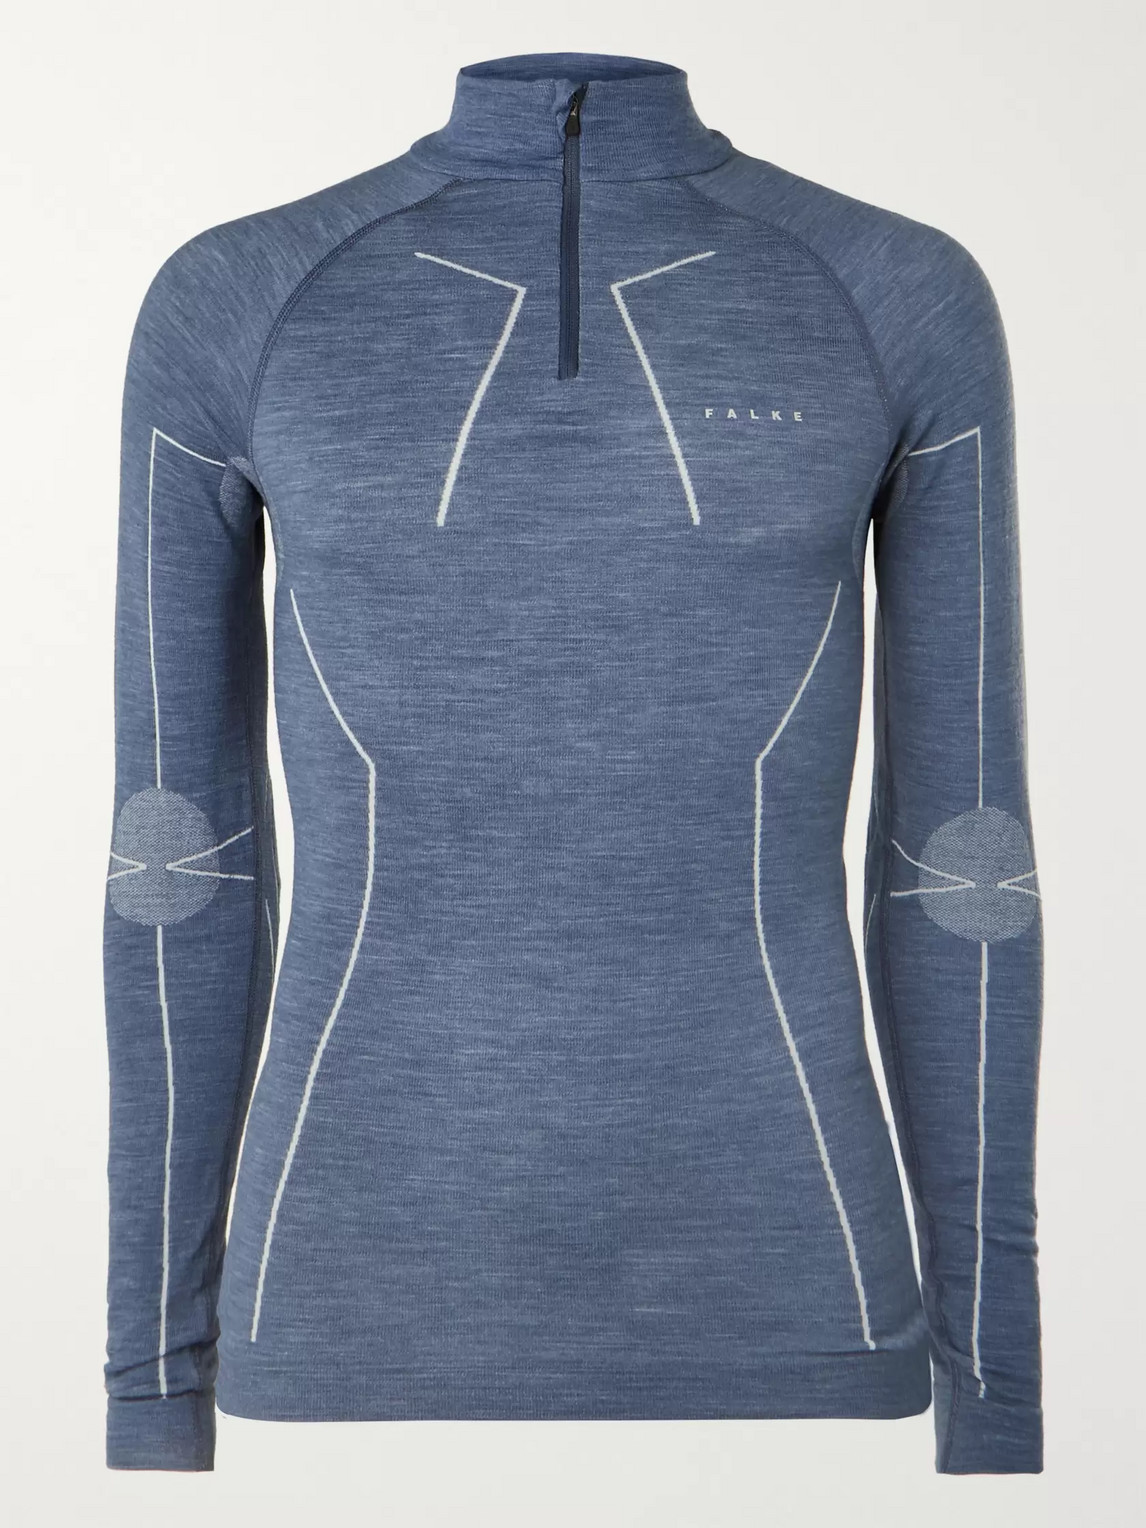 falke ergonomic sport system - stretch virgin wool-blend half-zip base layer - men - blue